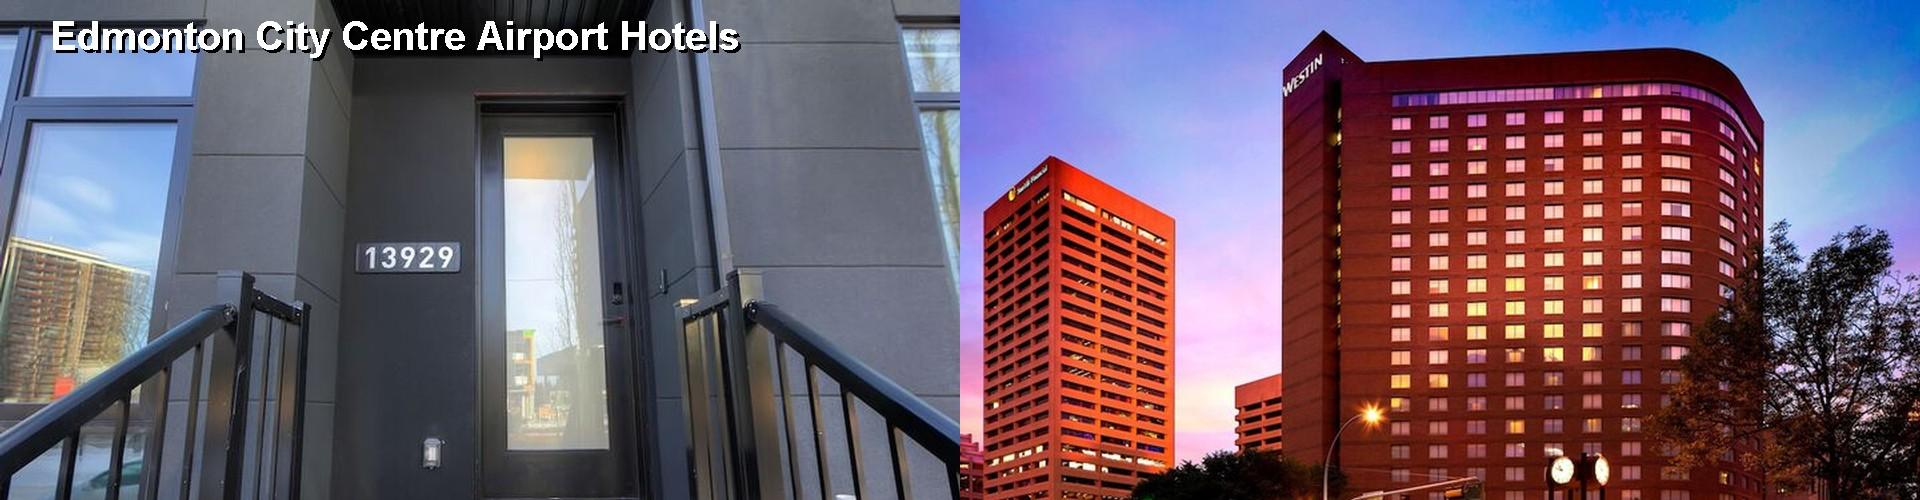 5 Best Hotels Near Edmonton City Centre Airport